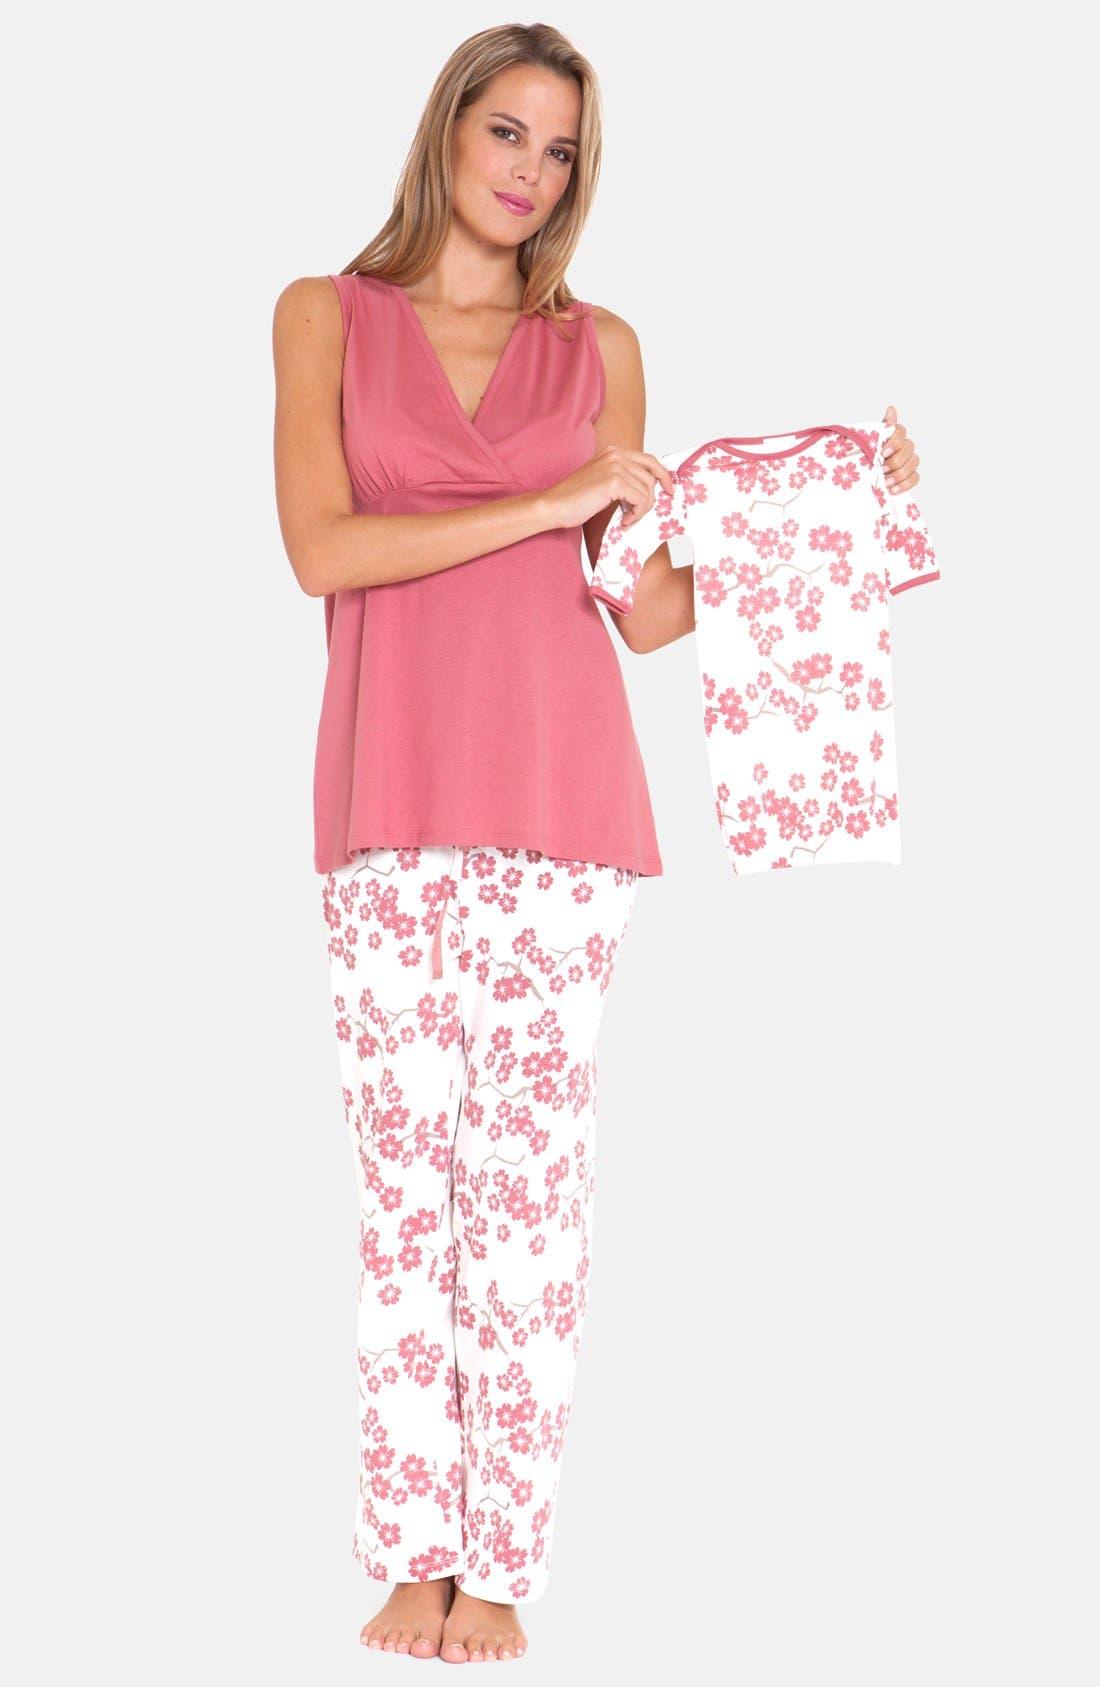 4-Piece Maternity Sleepwear Gift Set,                             Main thumbnail 1, color,